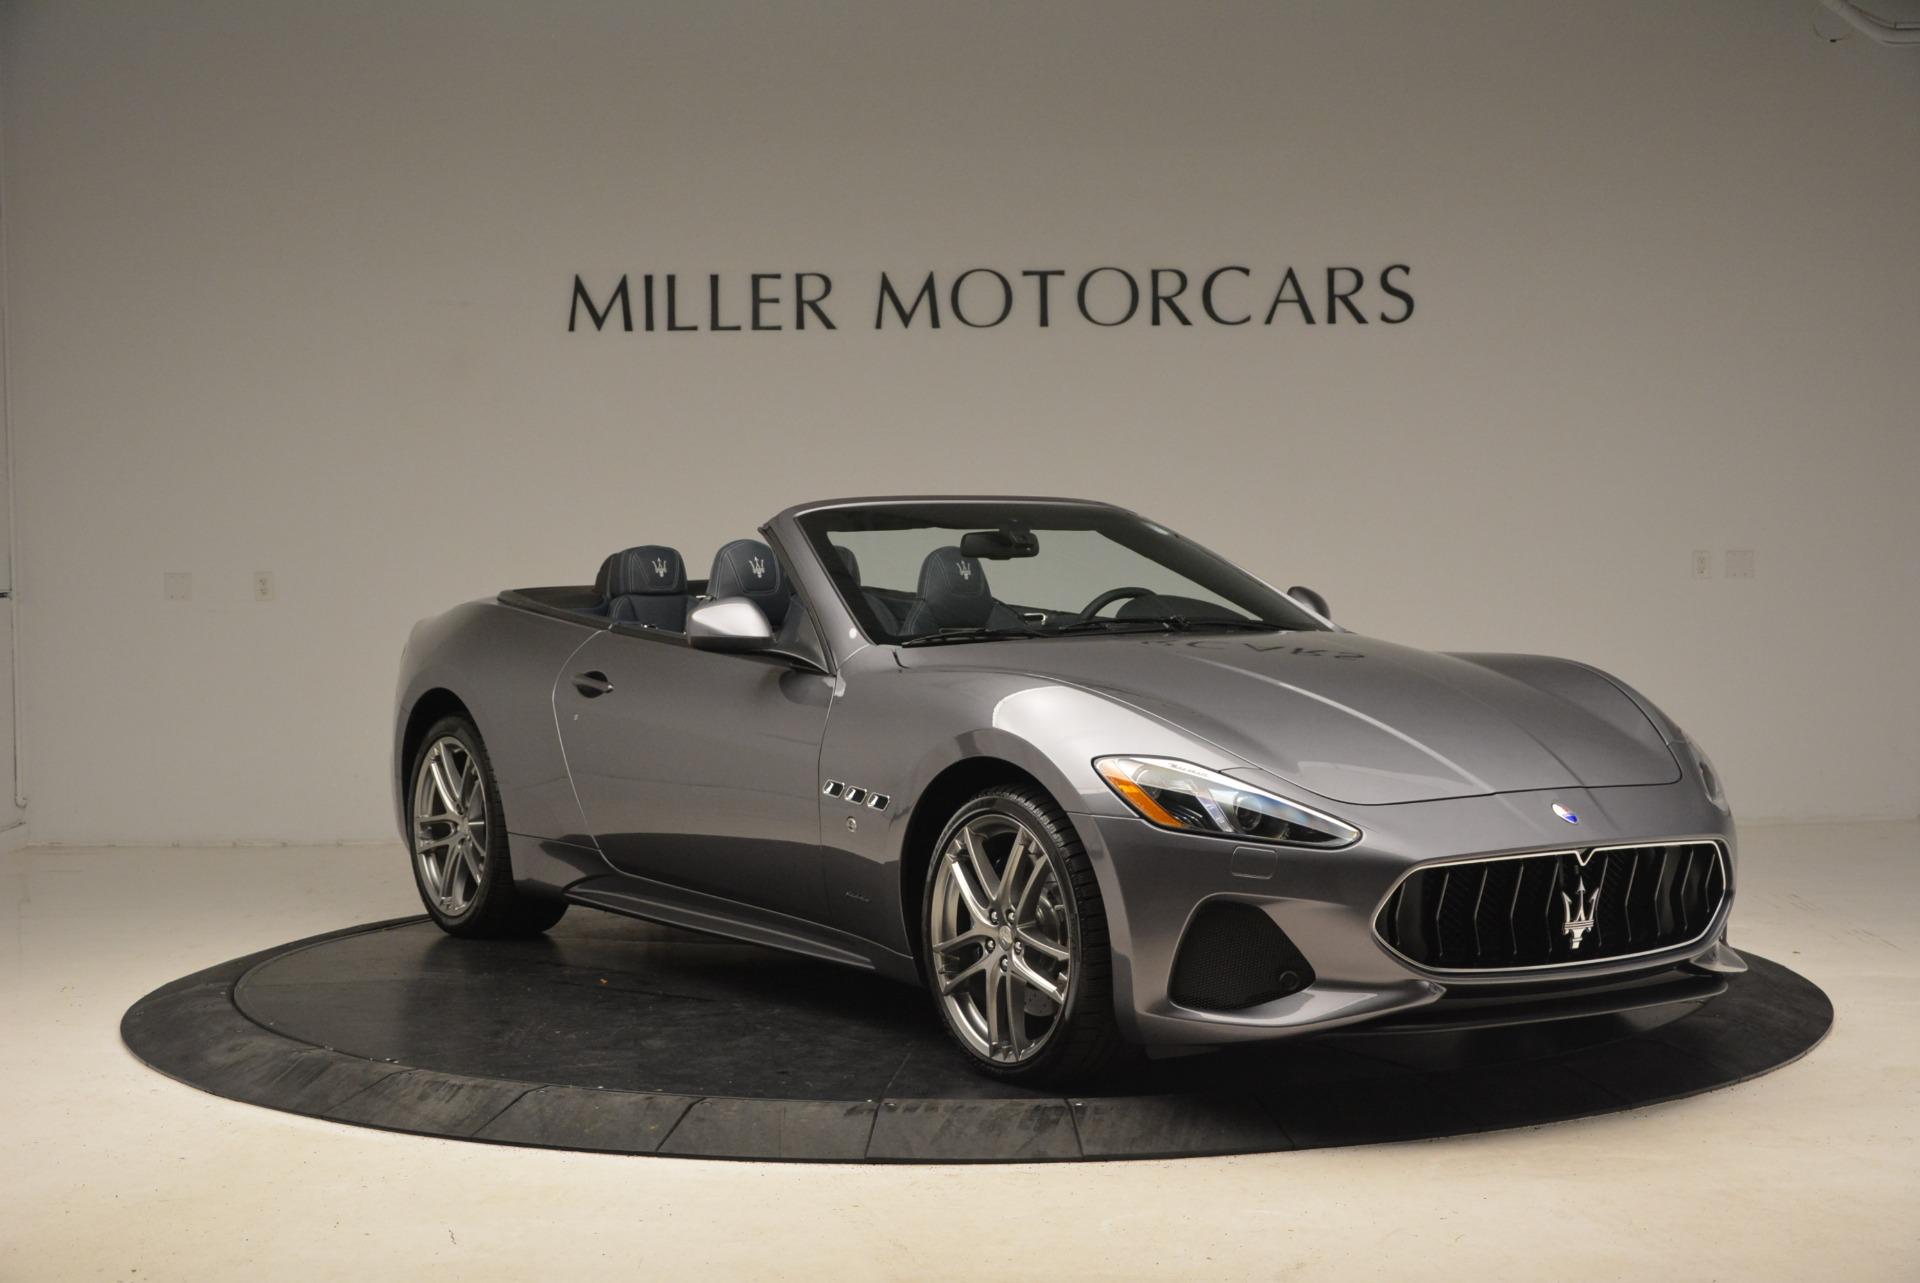 miller motorcars | new aston martin, bugatti, maserati, bentley